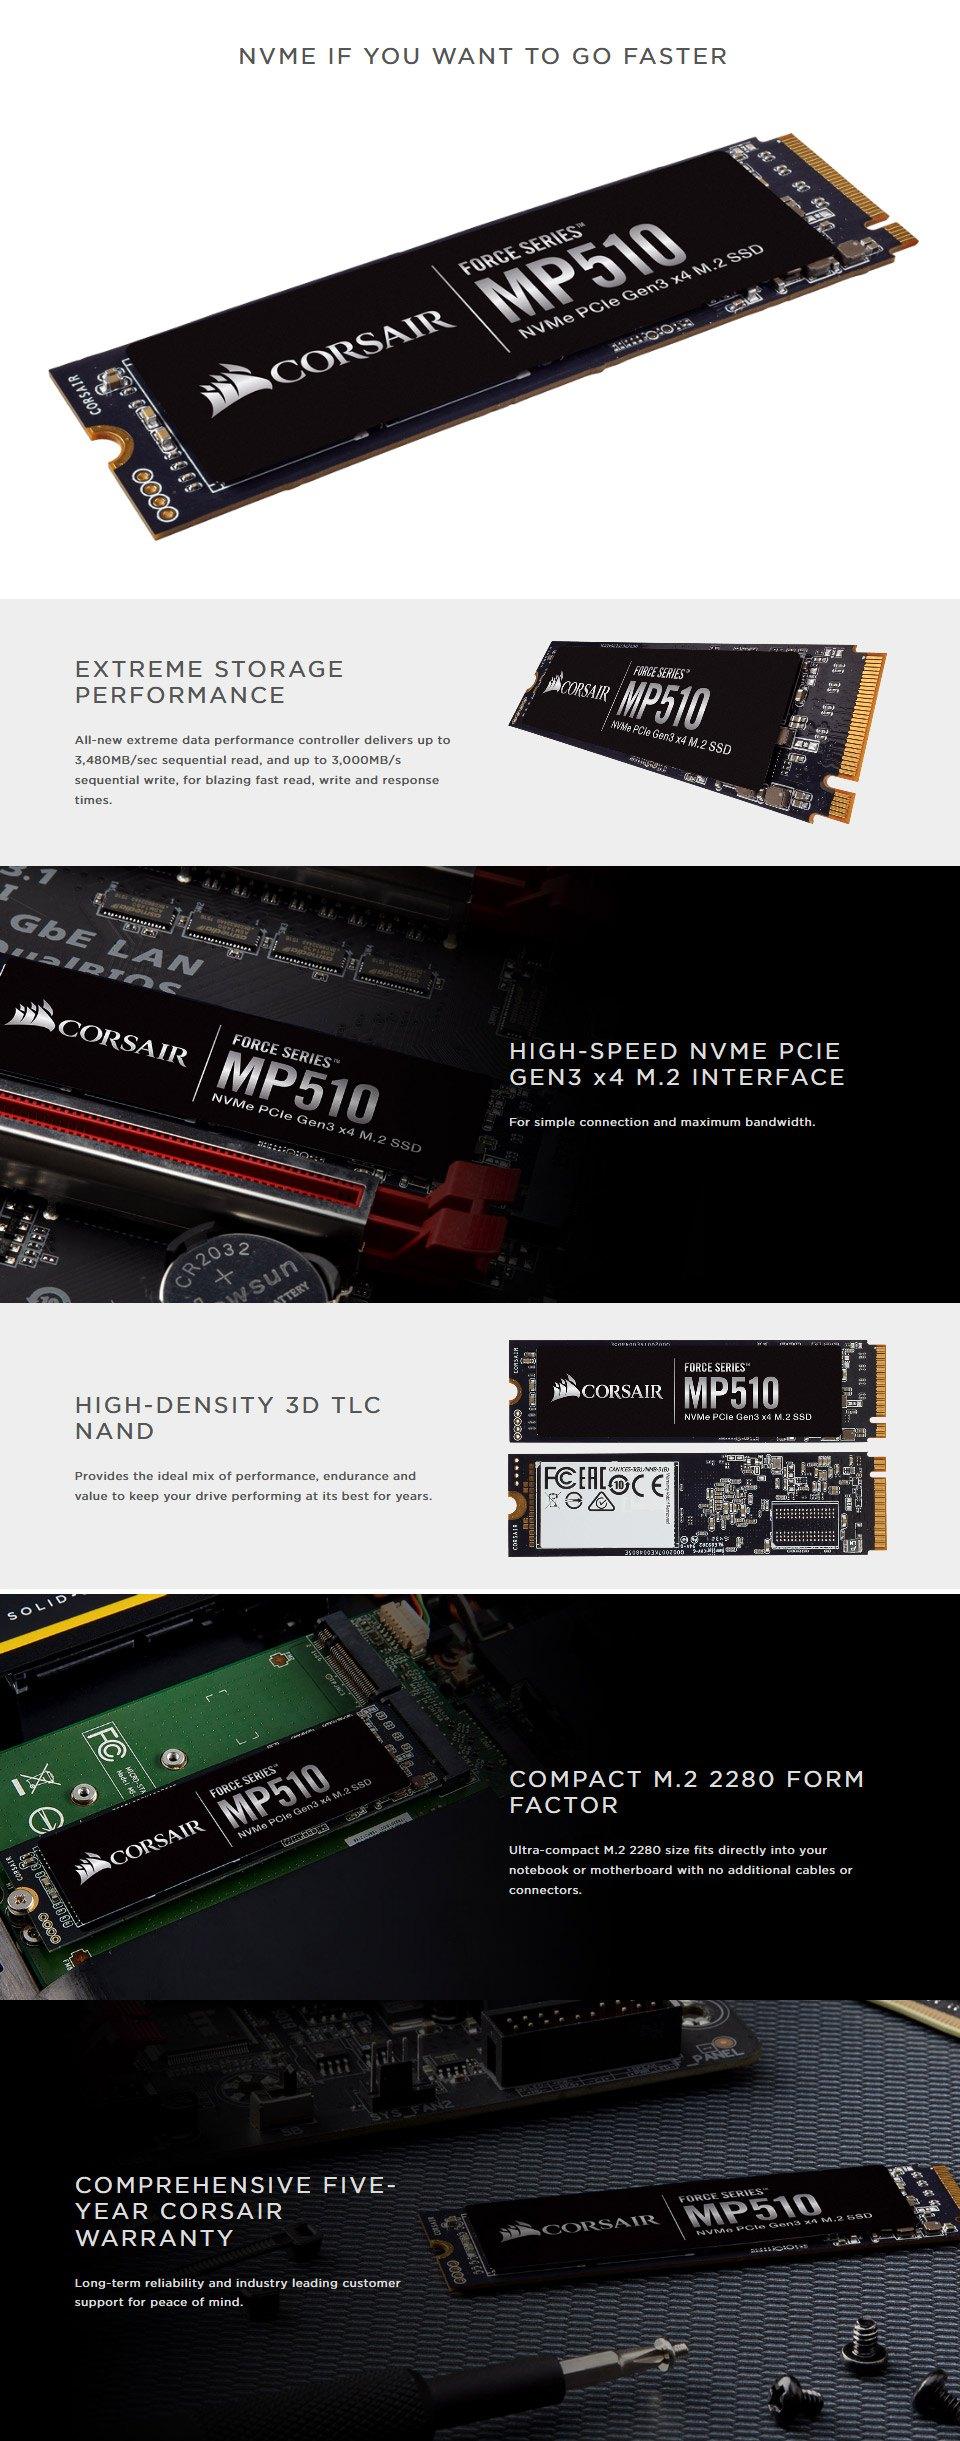 Corsair Force Series MP510B 960GB M.2 NVME SSD features